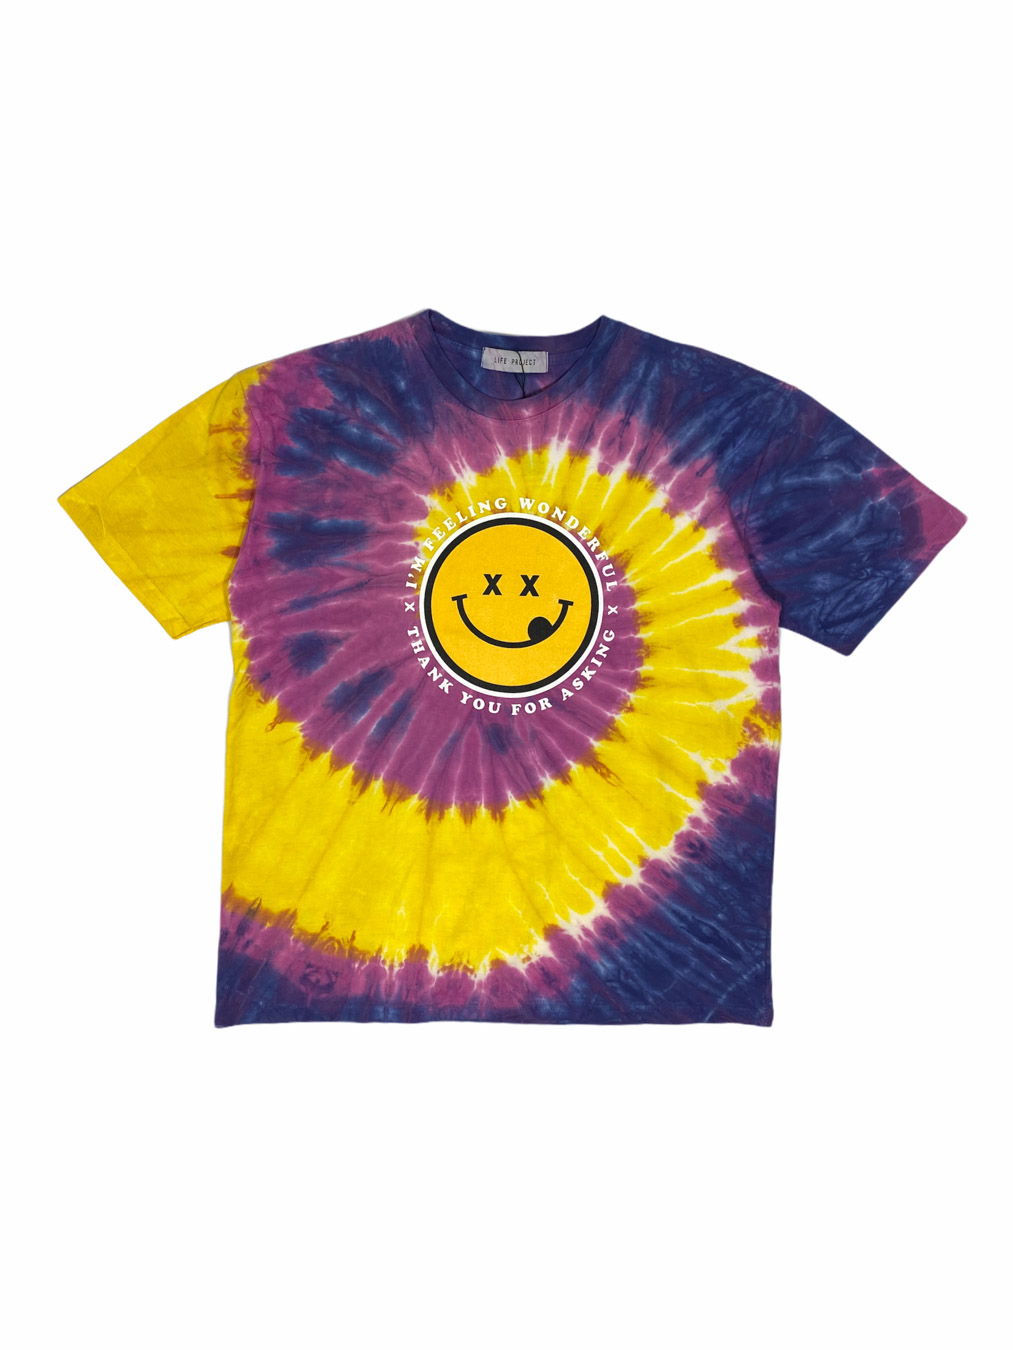 I'm Feeling Wonderful T-Shirt (Muliticolor Tie-Dye)